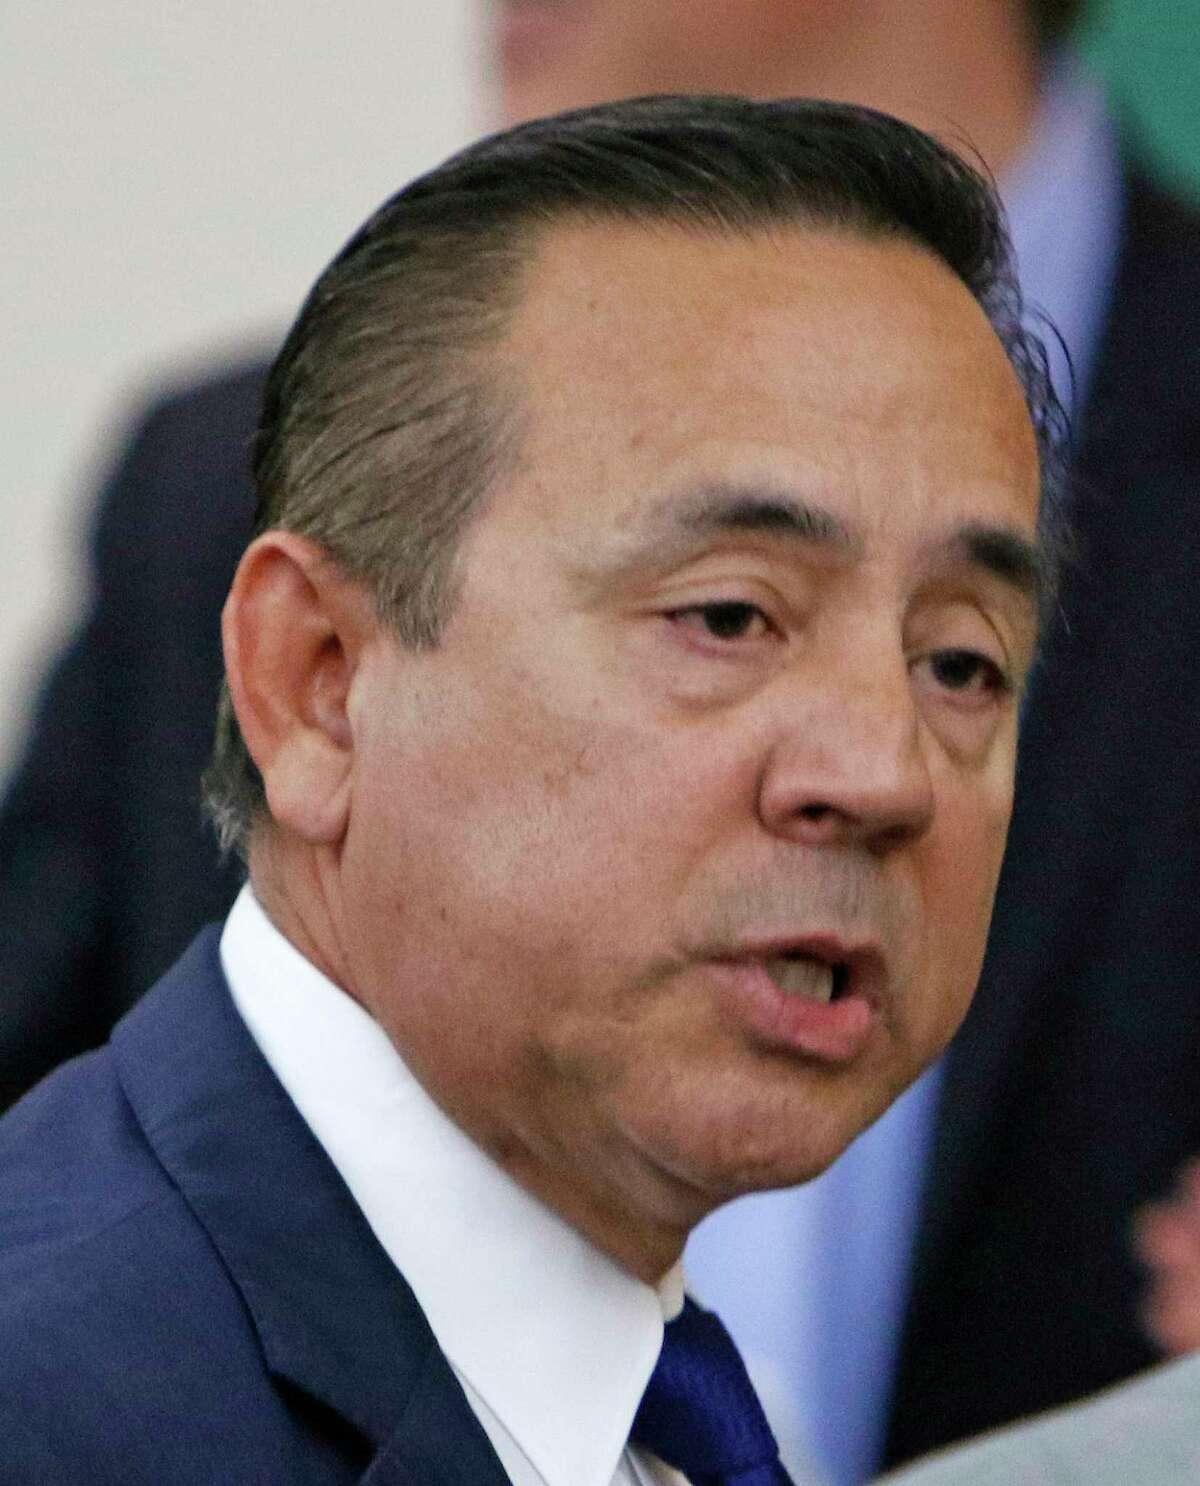 State Sen. Carlos Uresti, D-San Antonio